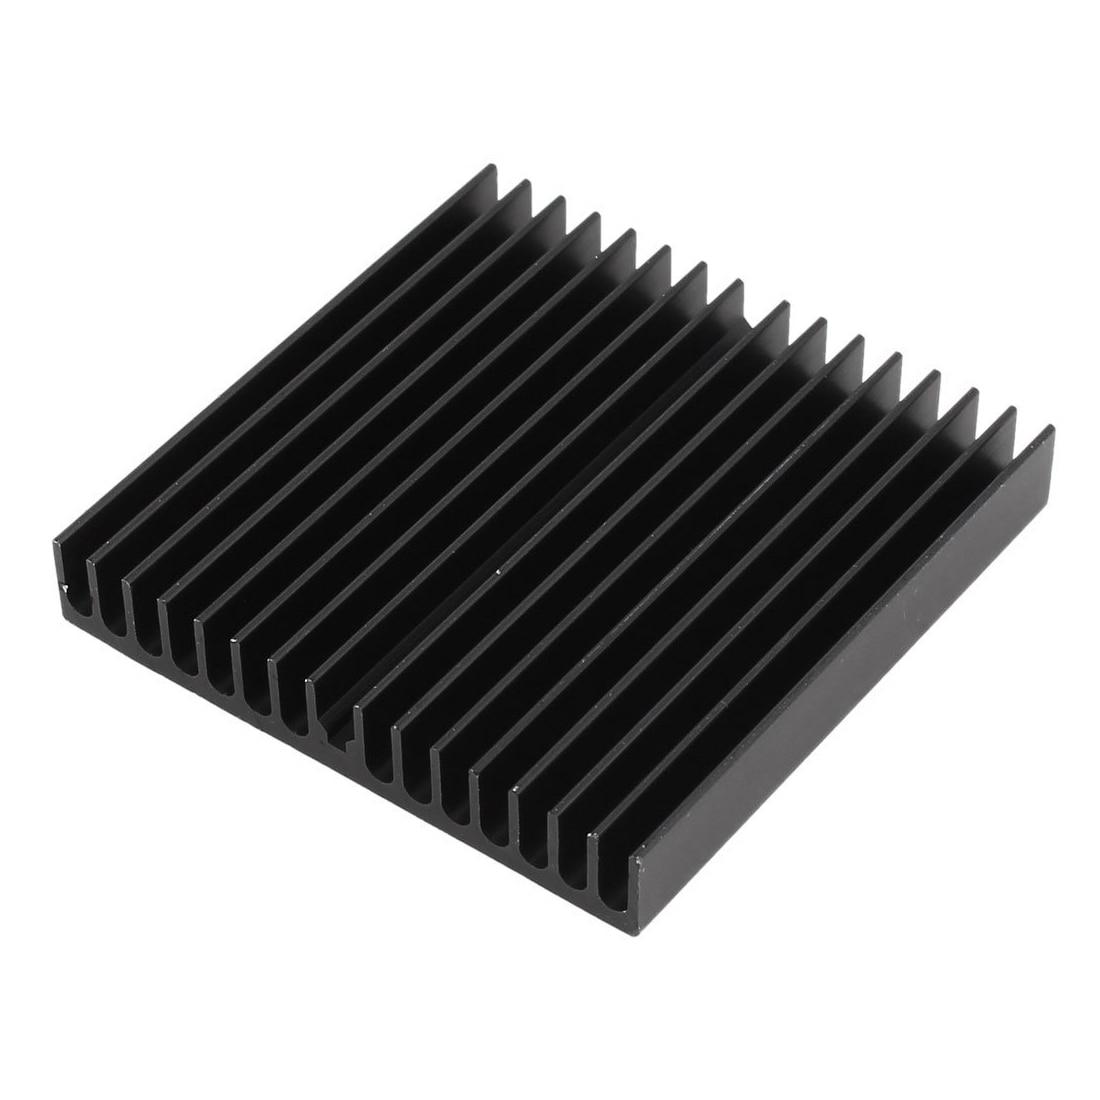 Hot 1 pcs Aluminum Radiator Heat Sink Heatsink 60mm x 60mm x 10mm Black 5pcs lot pure copper broken groove memory mos radiator fin raspberry pi chip notebook radiator 14 14 4 0mm copper heatsink